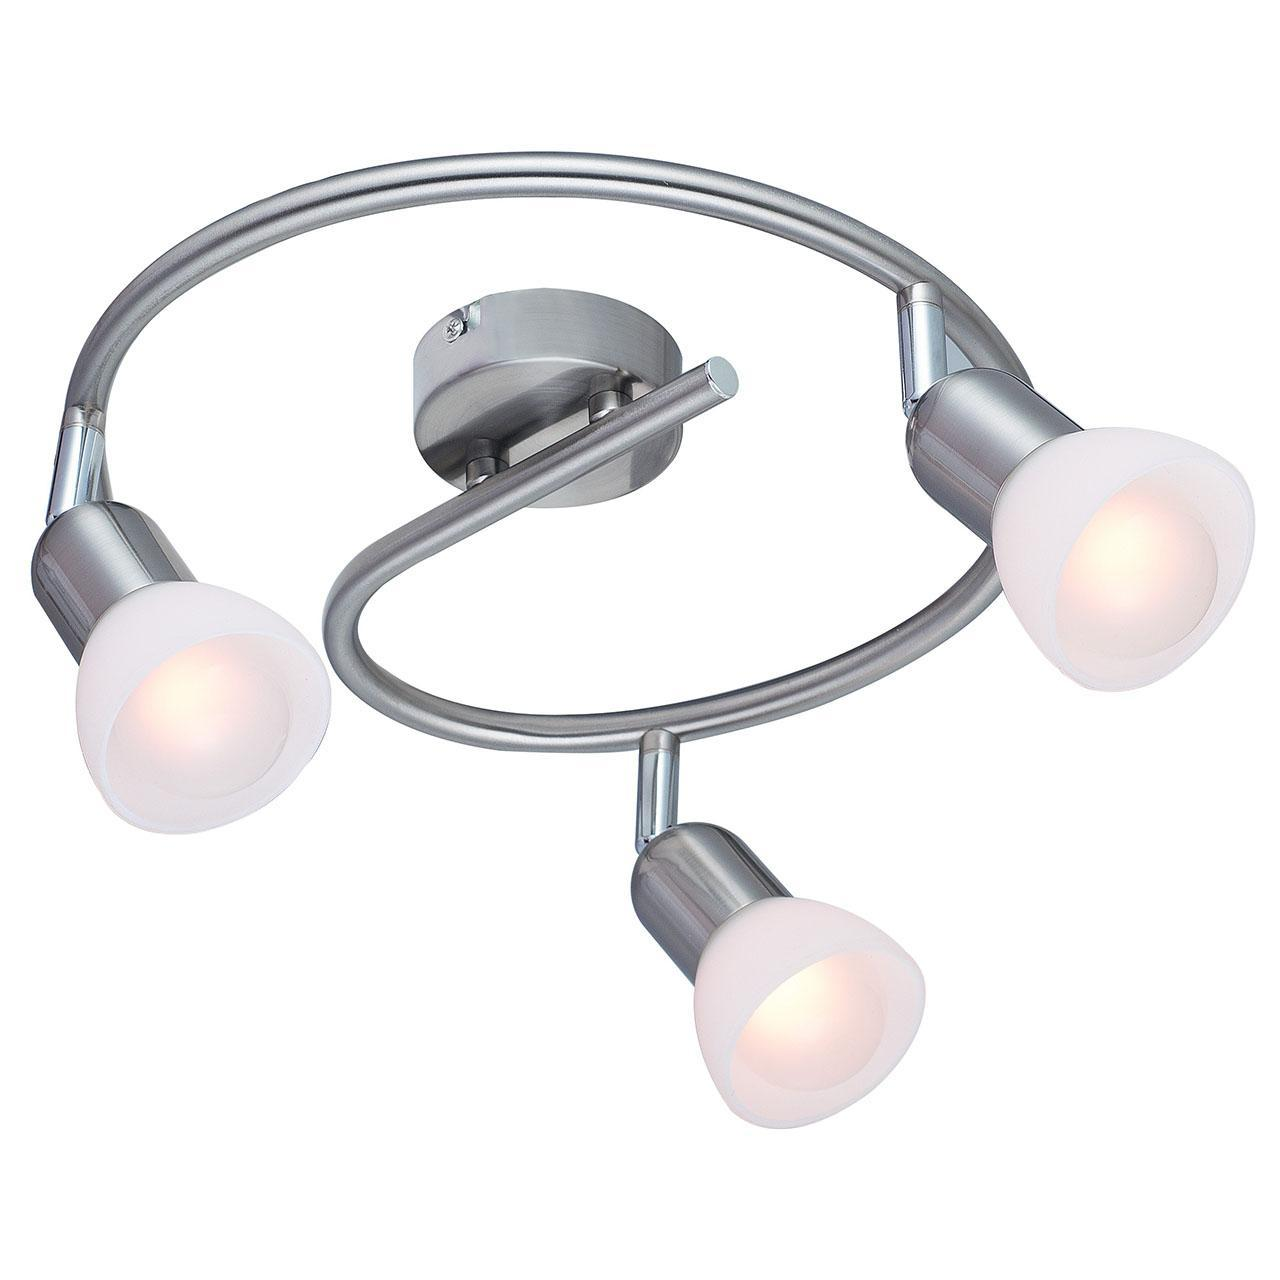 Спот Arte Lamp A3115PL-3SS arte lamp спот arte lamp 98 a4509pl 3ss